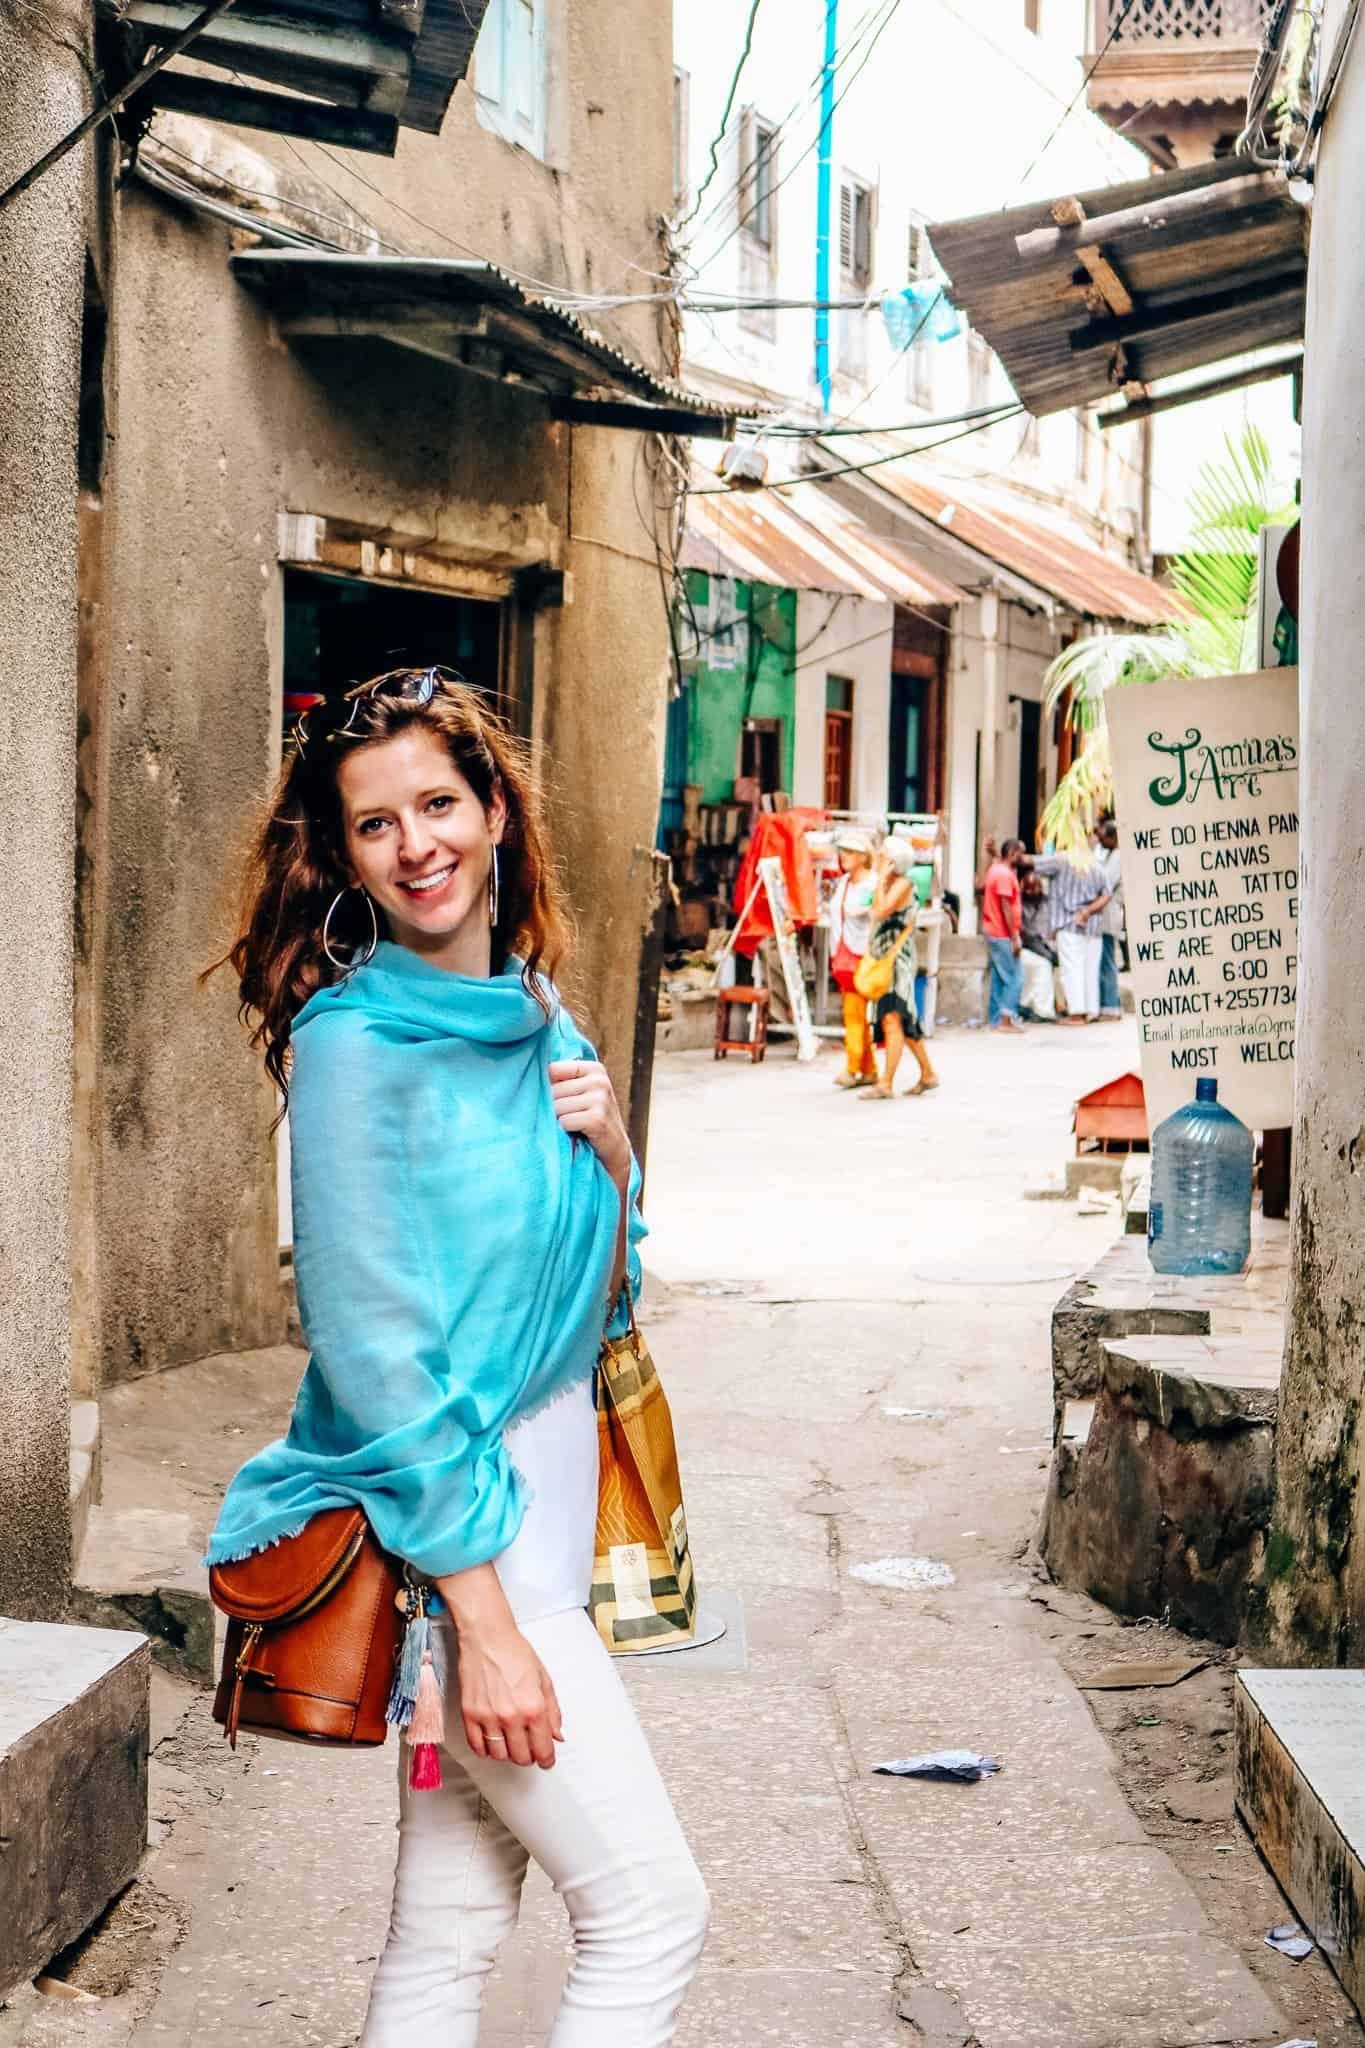 Visions of Zanzibar - Streets of Stone Town